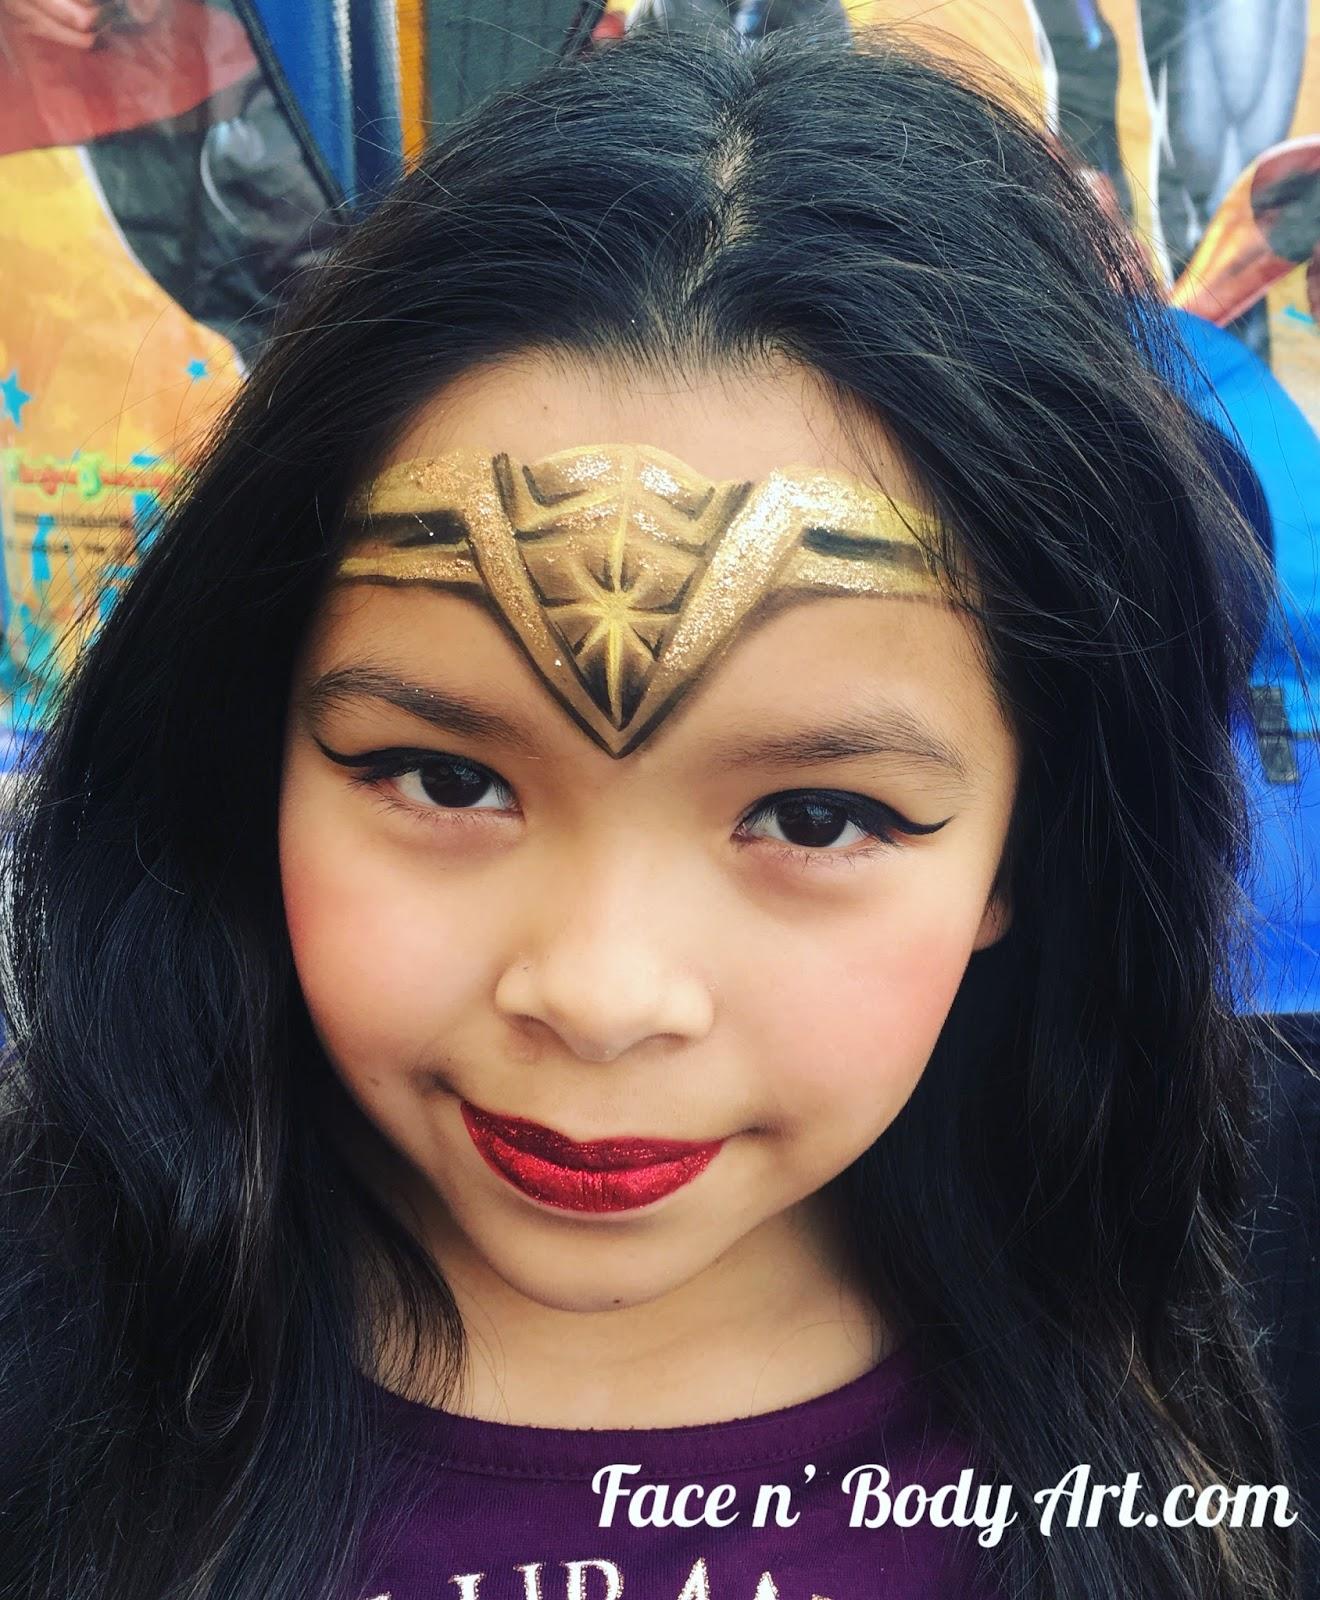 Shawna D Make Up Superhero Party Face Painting Makeup Monday